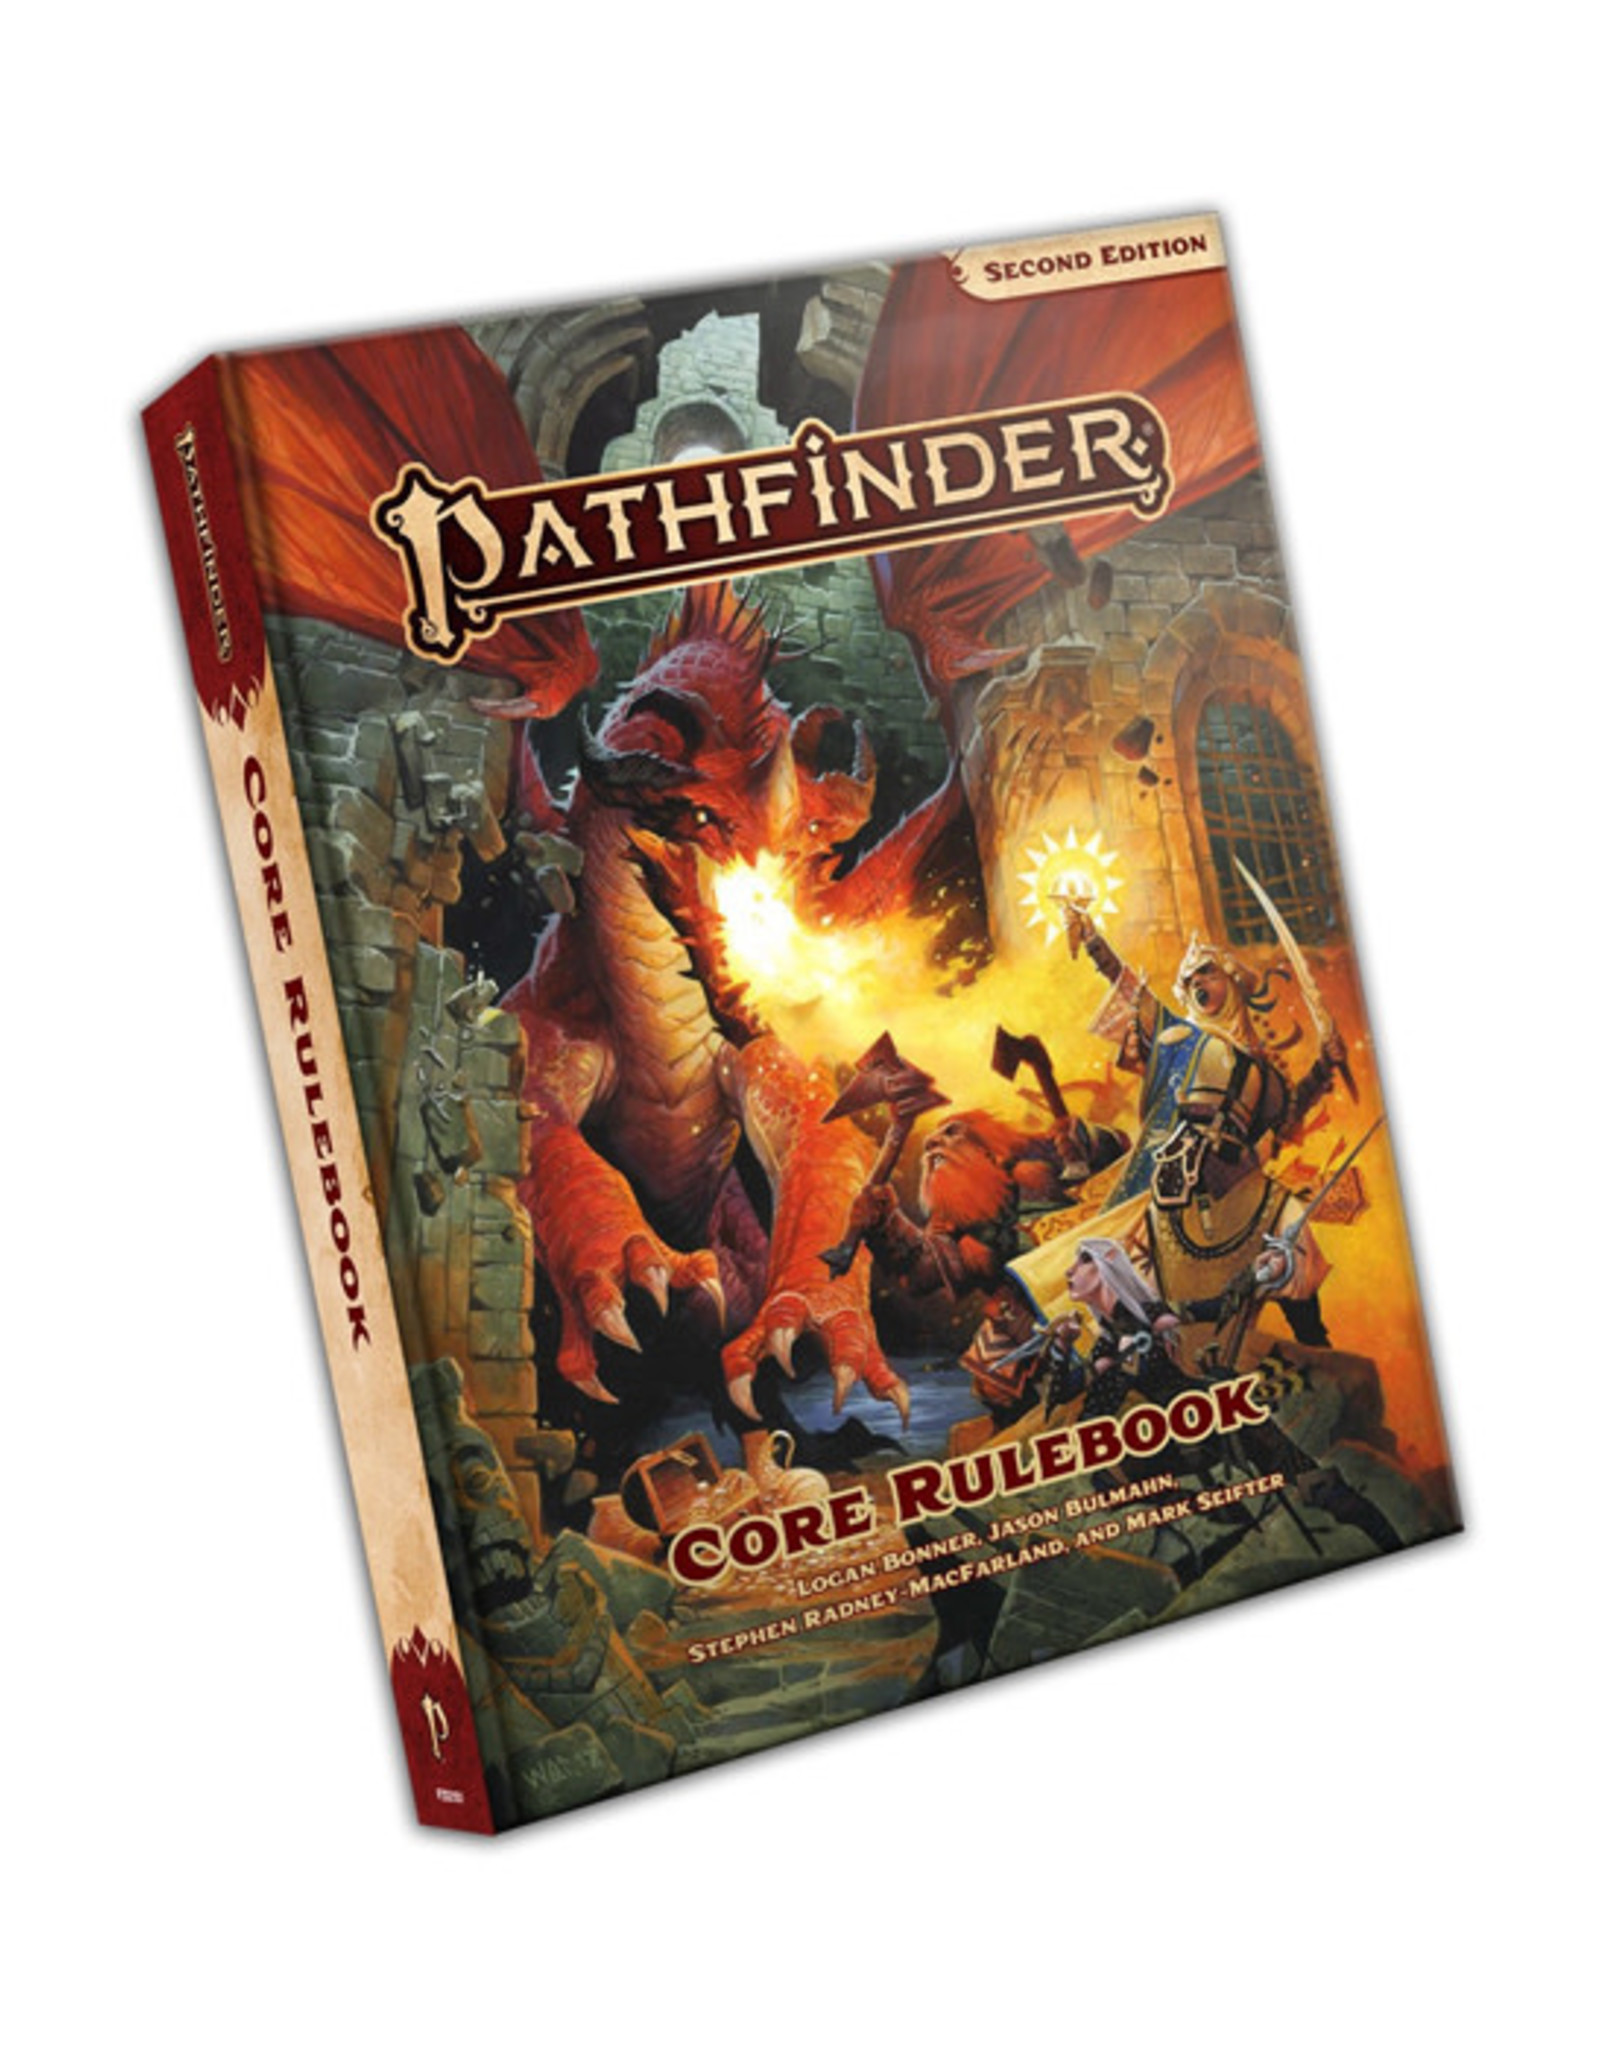 Pathfinder Pathfinder: 2nd Edition - Core Rulebook